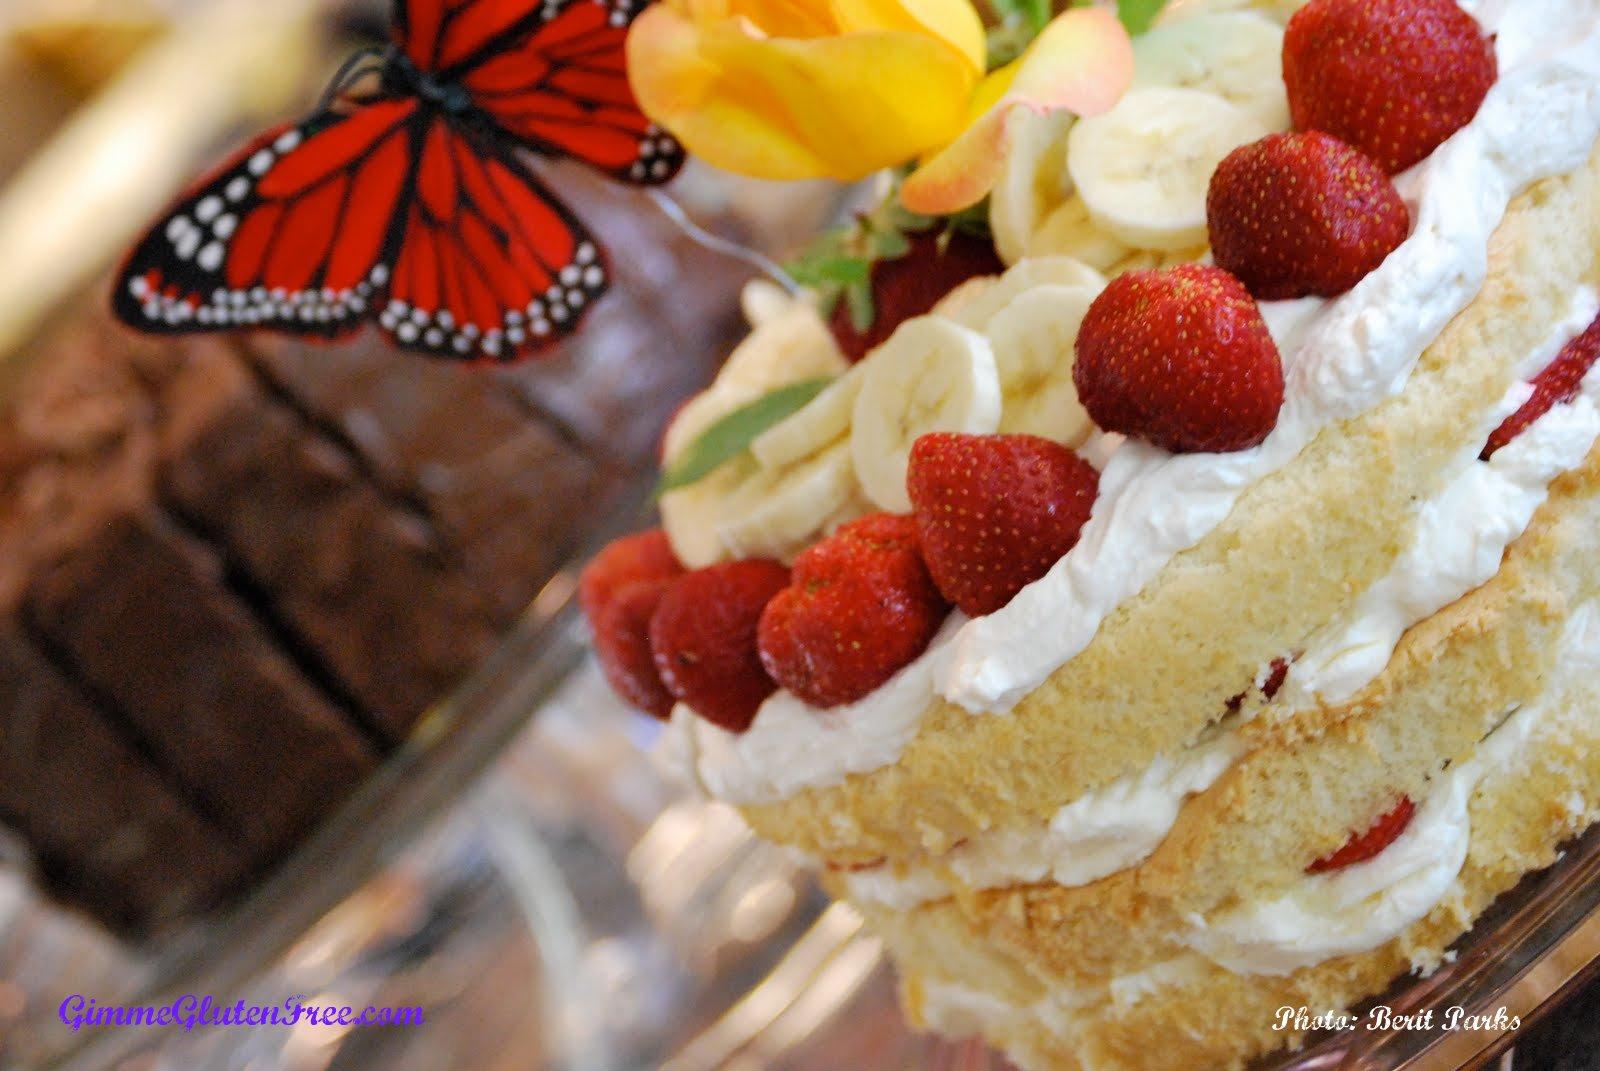 Gluten Free Cakes & Cupcakes